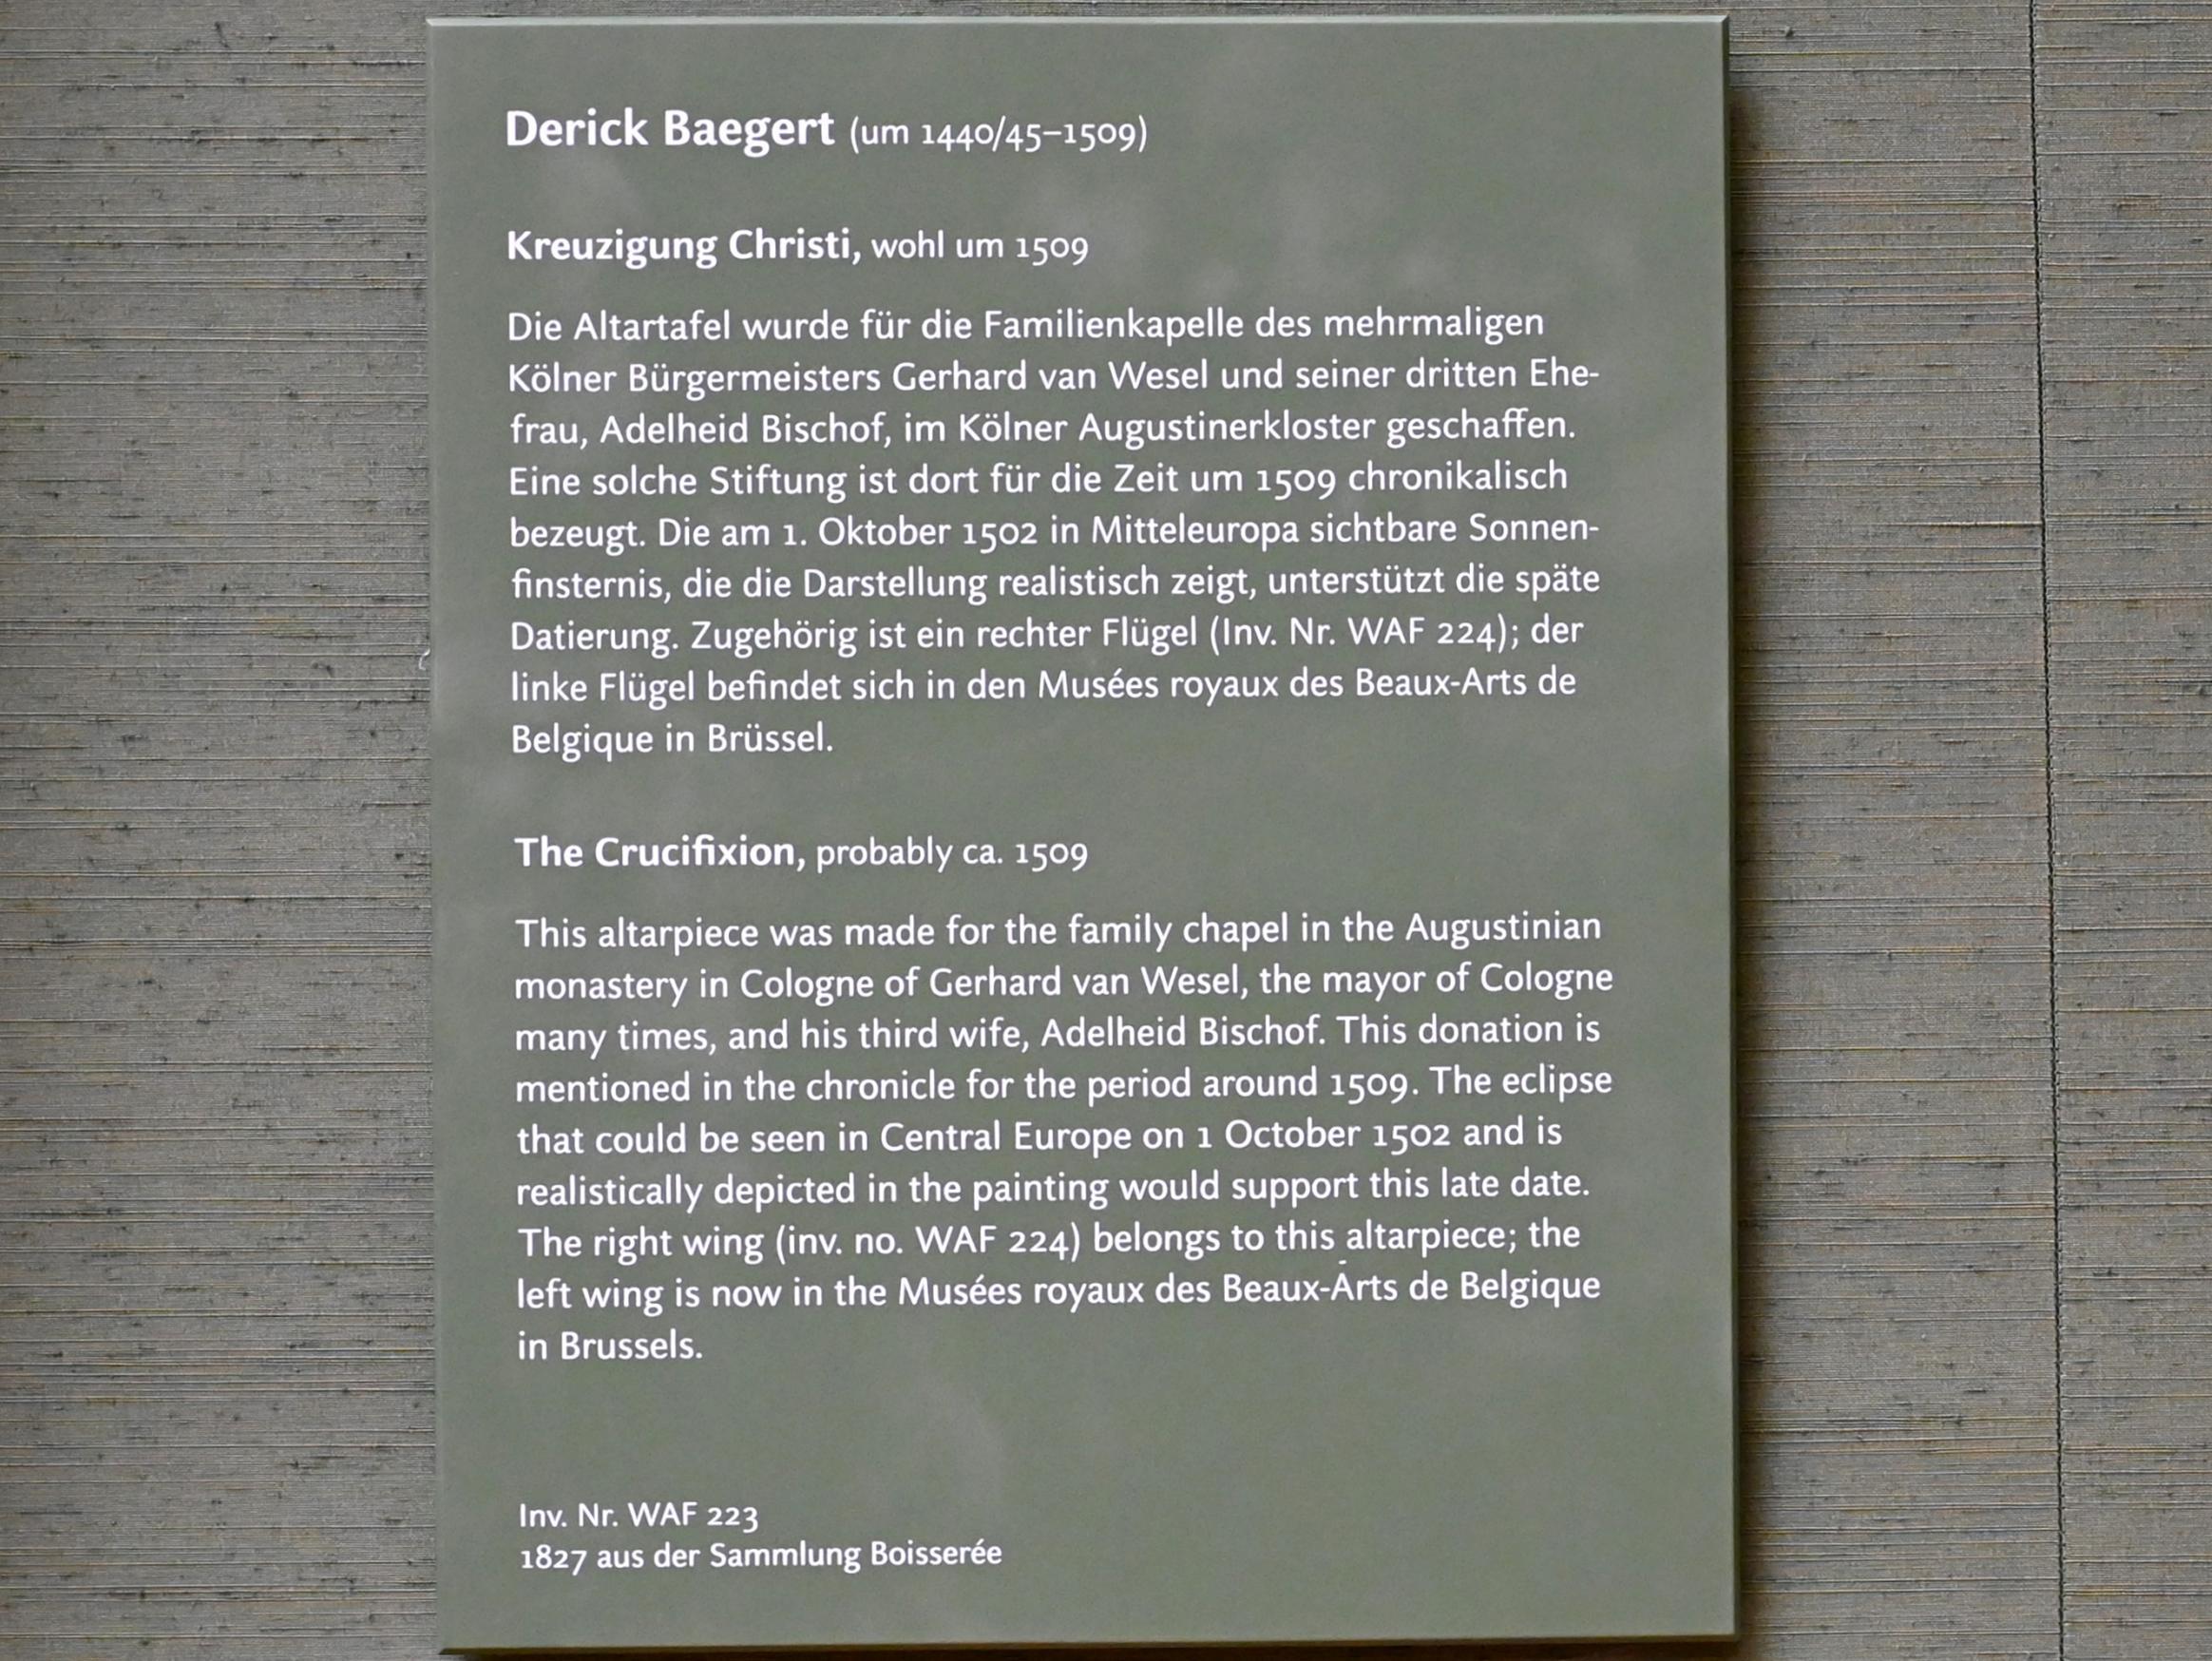 Derick Baegert: Kreuzigung Christi, Um 1509